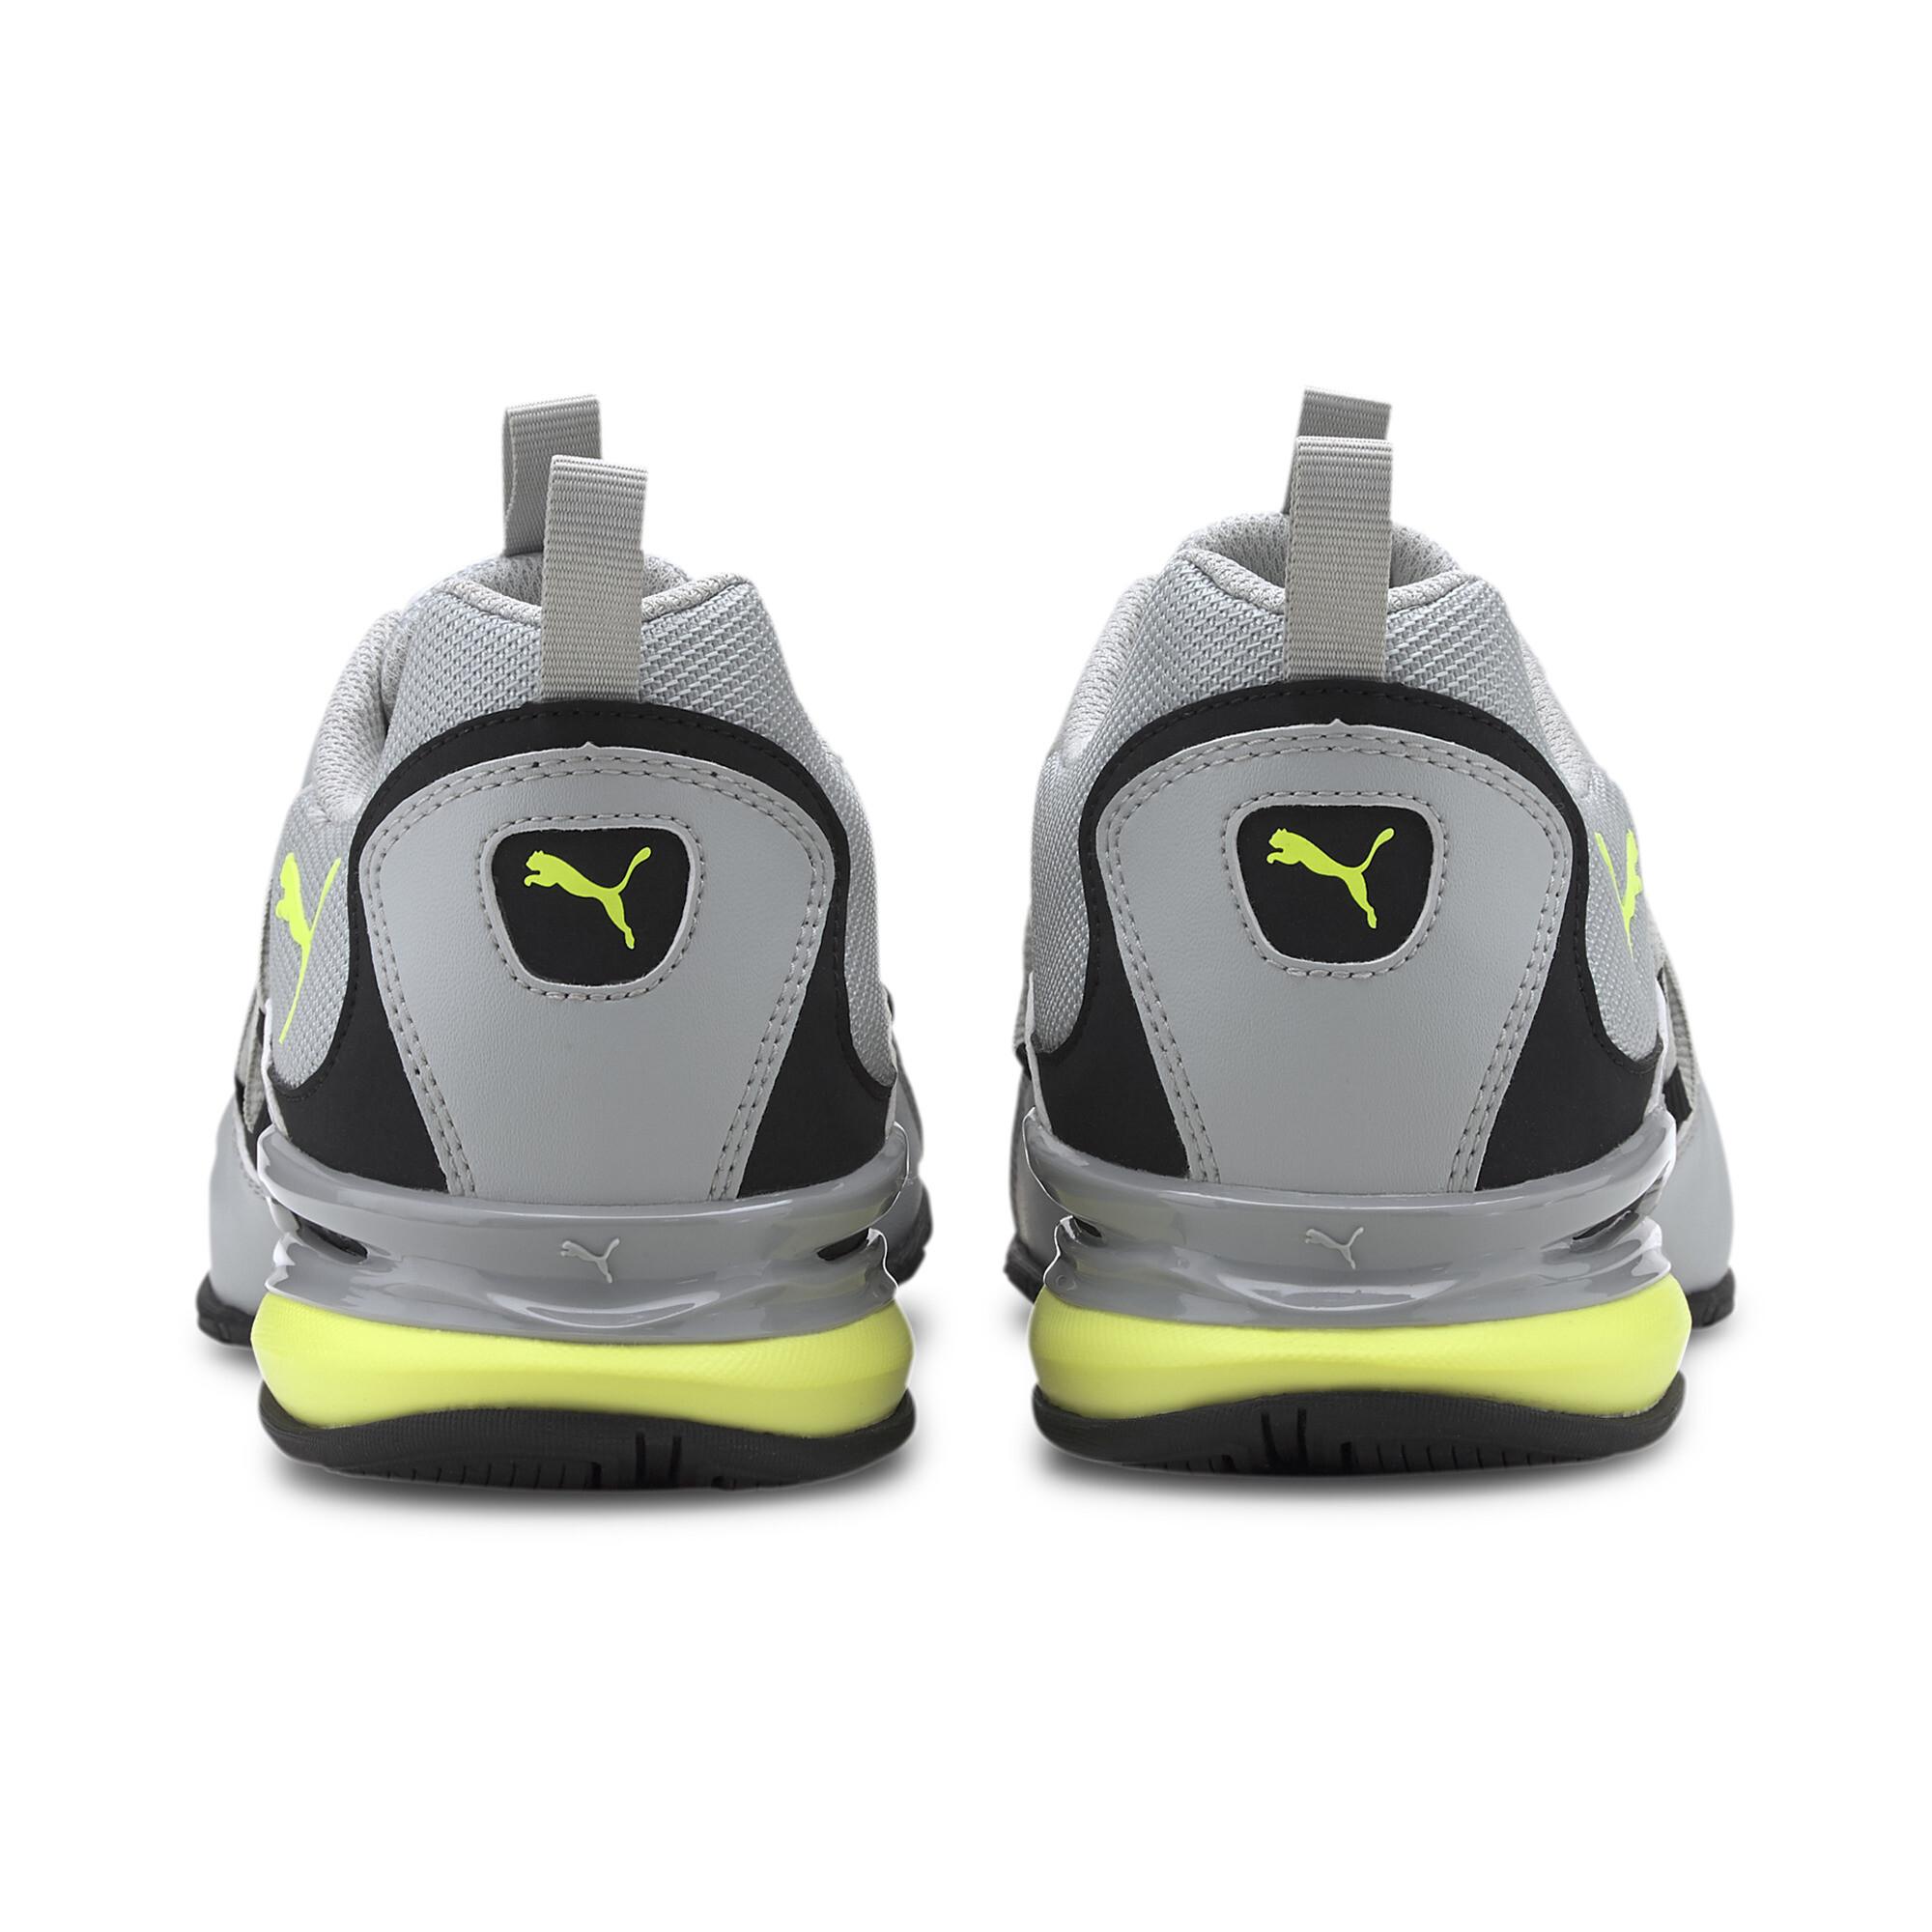 PUMA-Silverion-Men-s-Running-Shoes-Men-Shoe-Running thumbnail 18